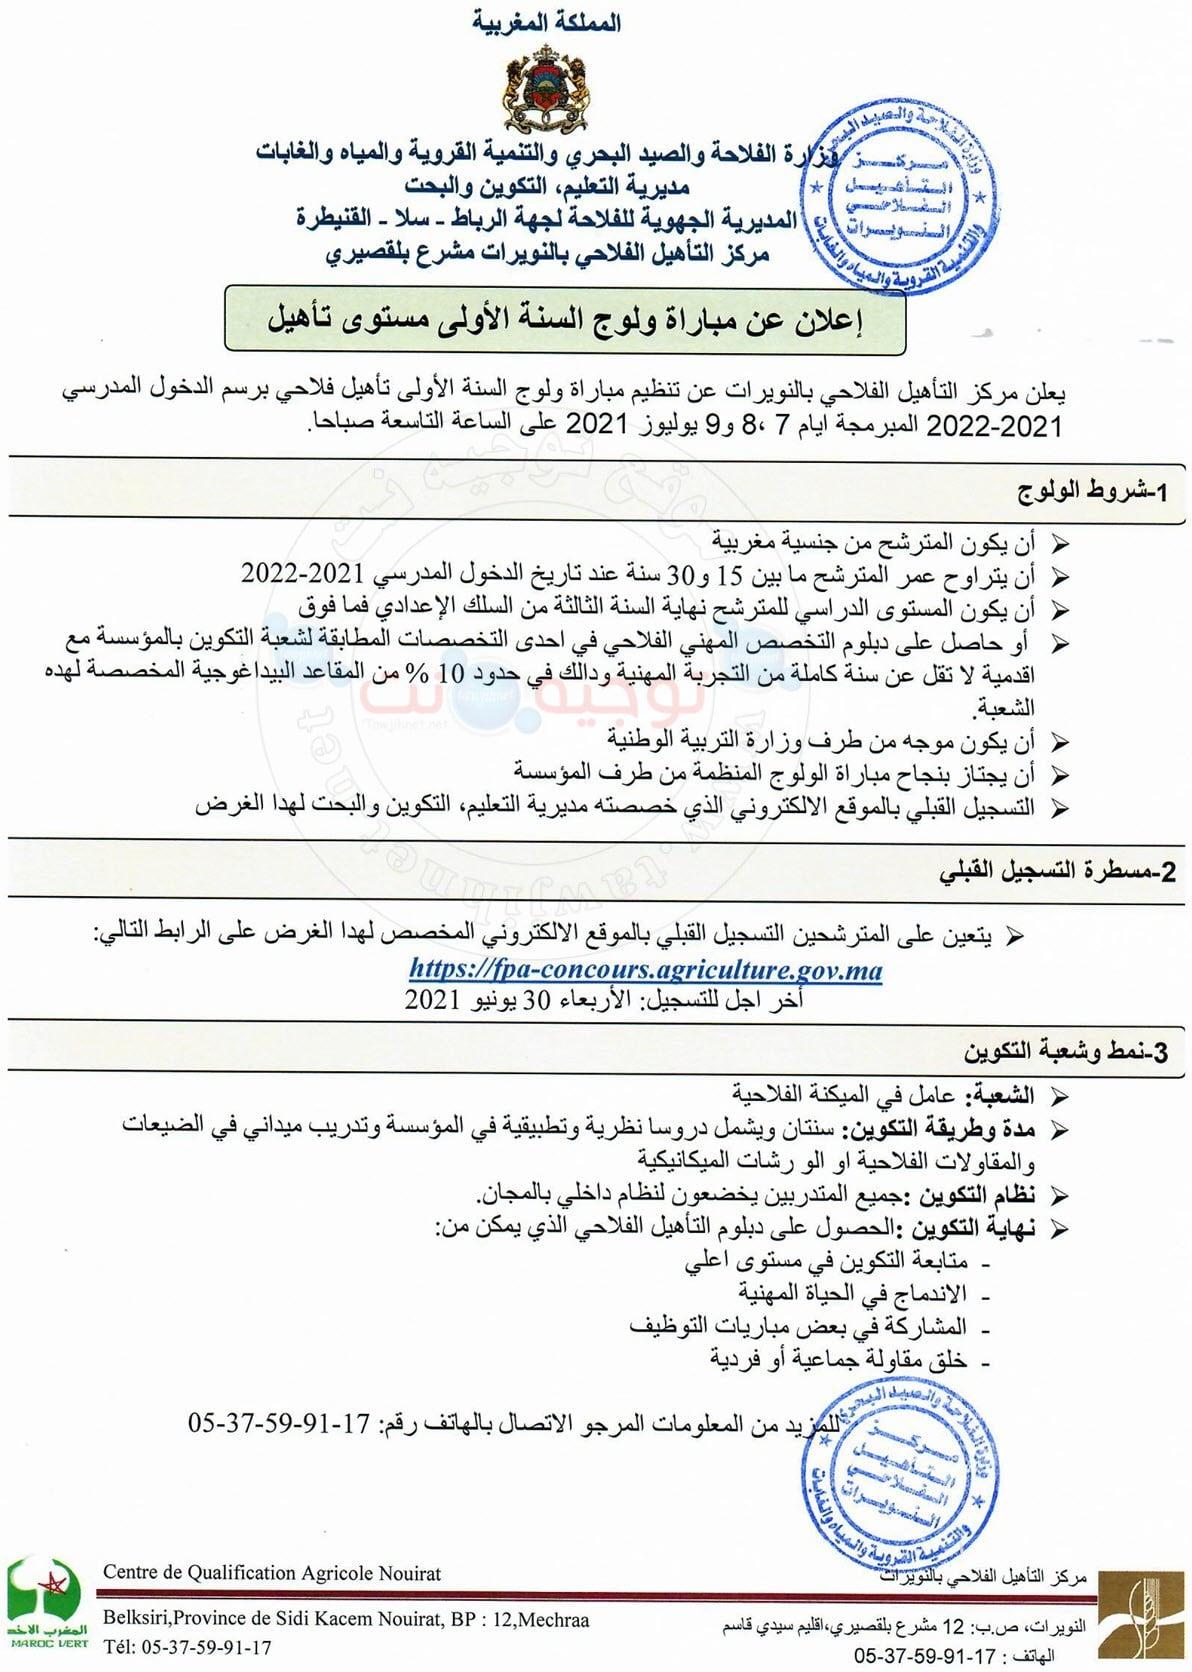 Concours Centre Qualification Agricole Nouirate 2021 - 2022 مركز التأهيل الفلاحي بالنويرات - مشرع بلقصيري